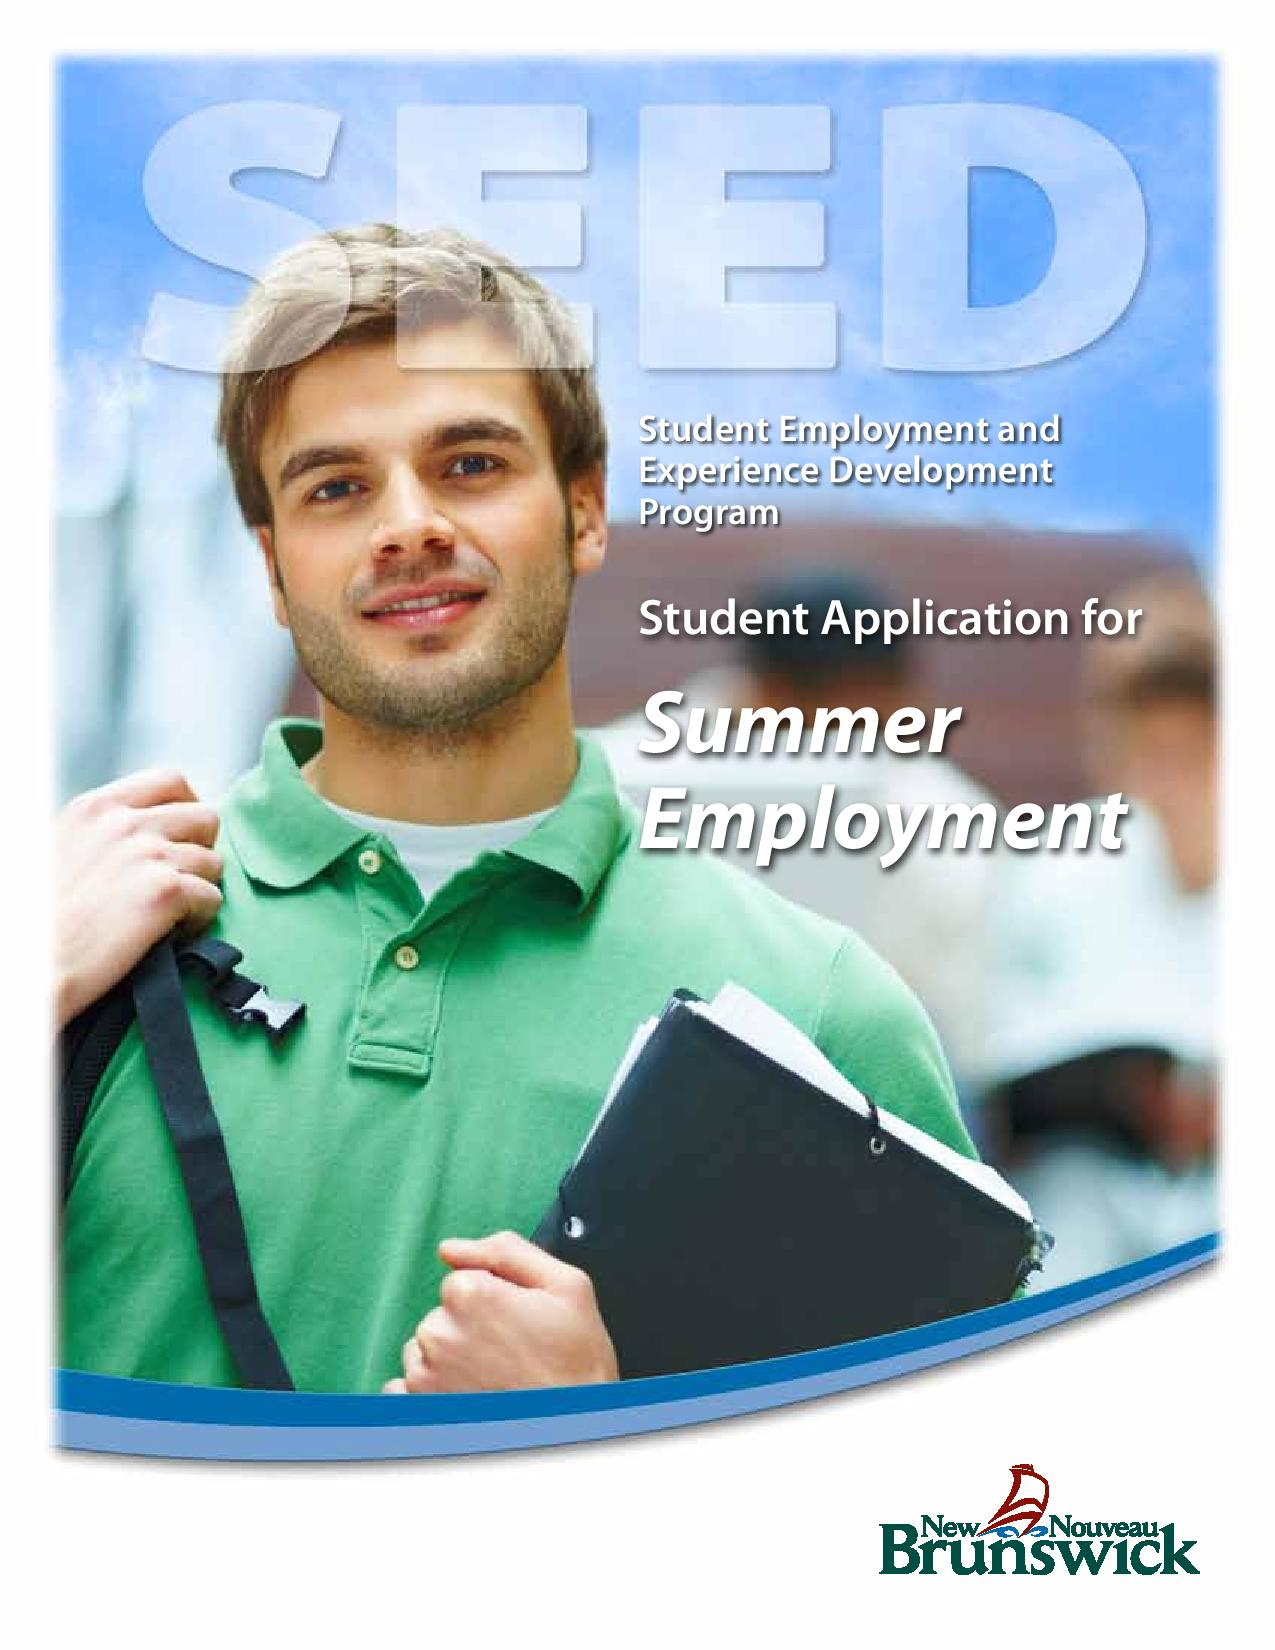 Student Employment & Experience Development Program